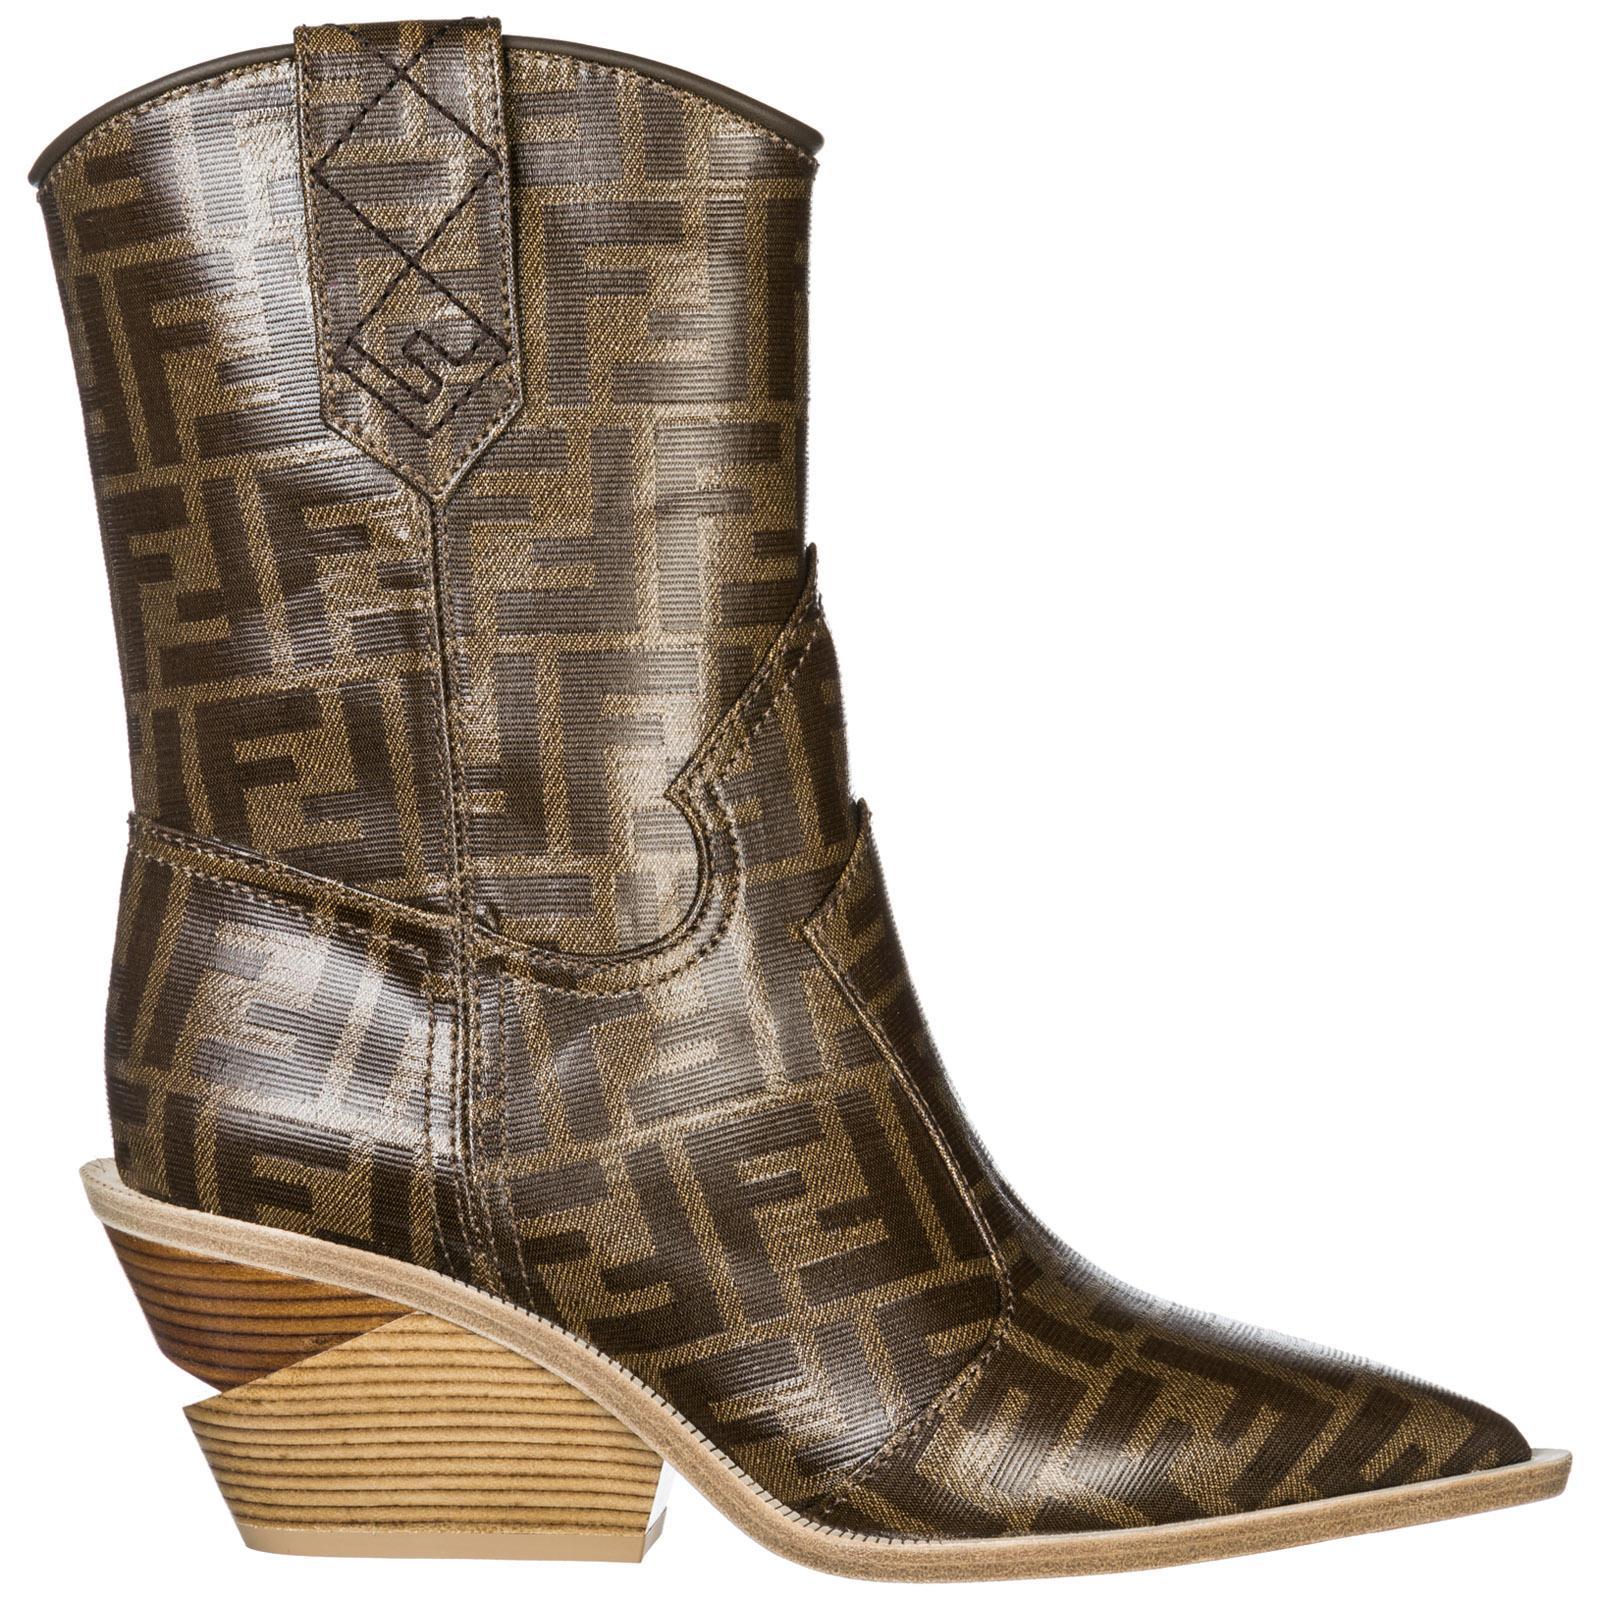 f23dd302be2f Heeled ankle boots Fendi 8T6785YLZF0CMY mogano panna